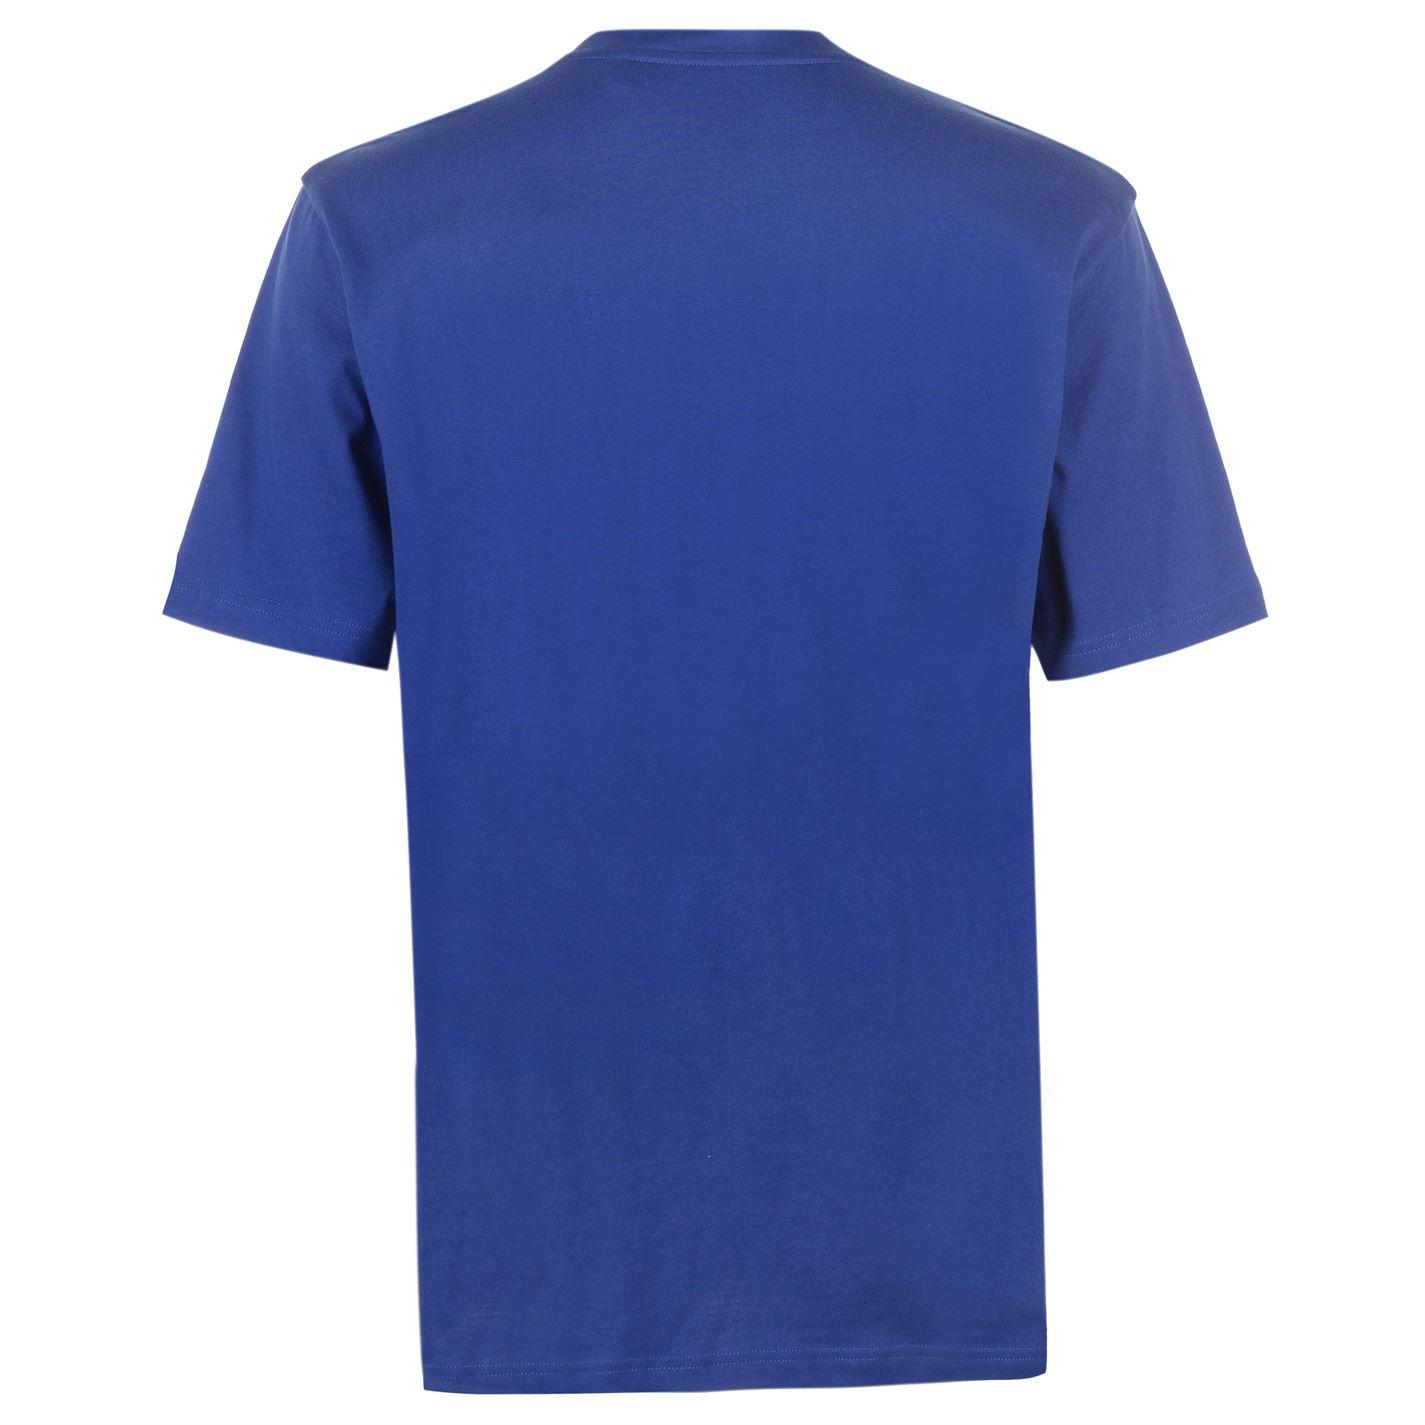 1b4a0996 Hot Tuna Mens T Shirt Crew Neck Tee Top Short Sleeve Print   eBay